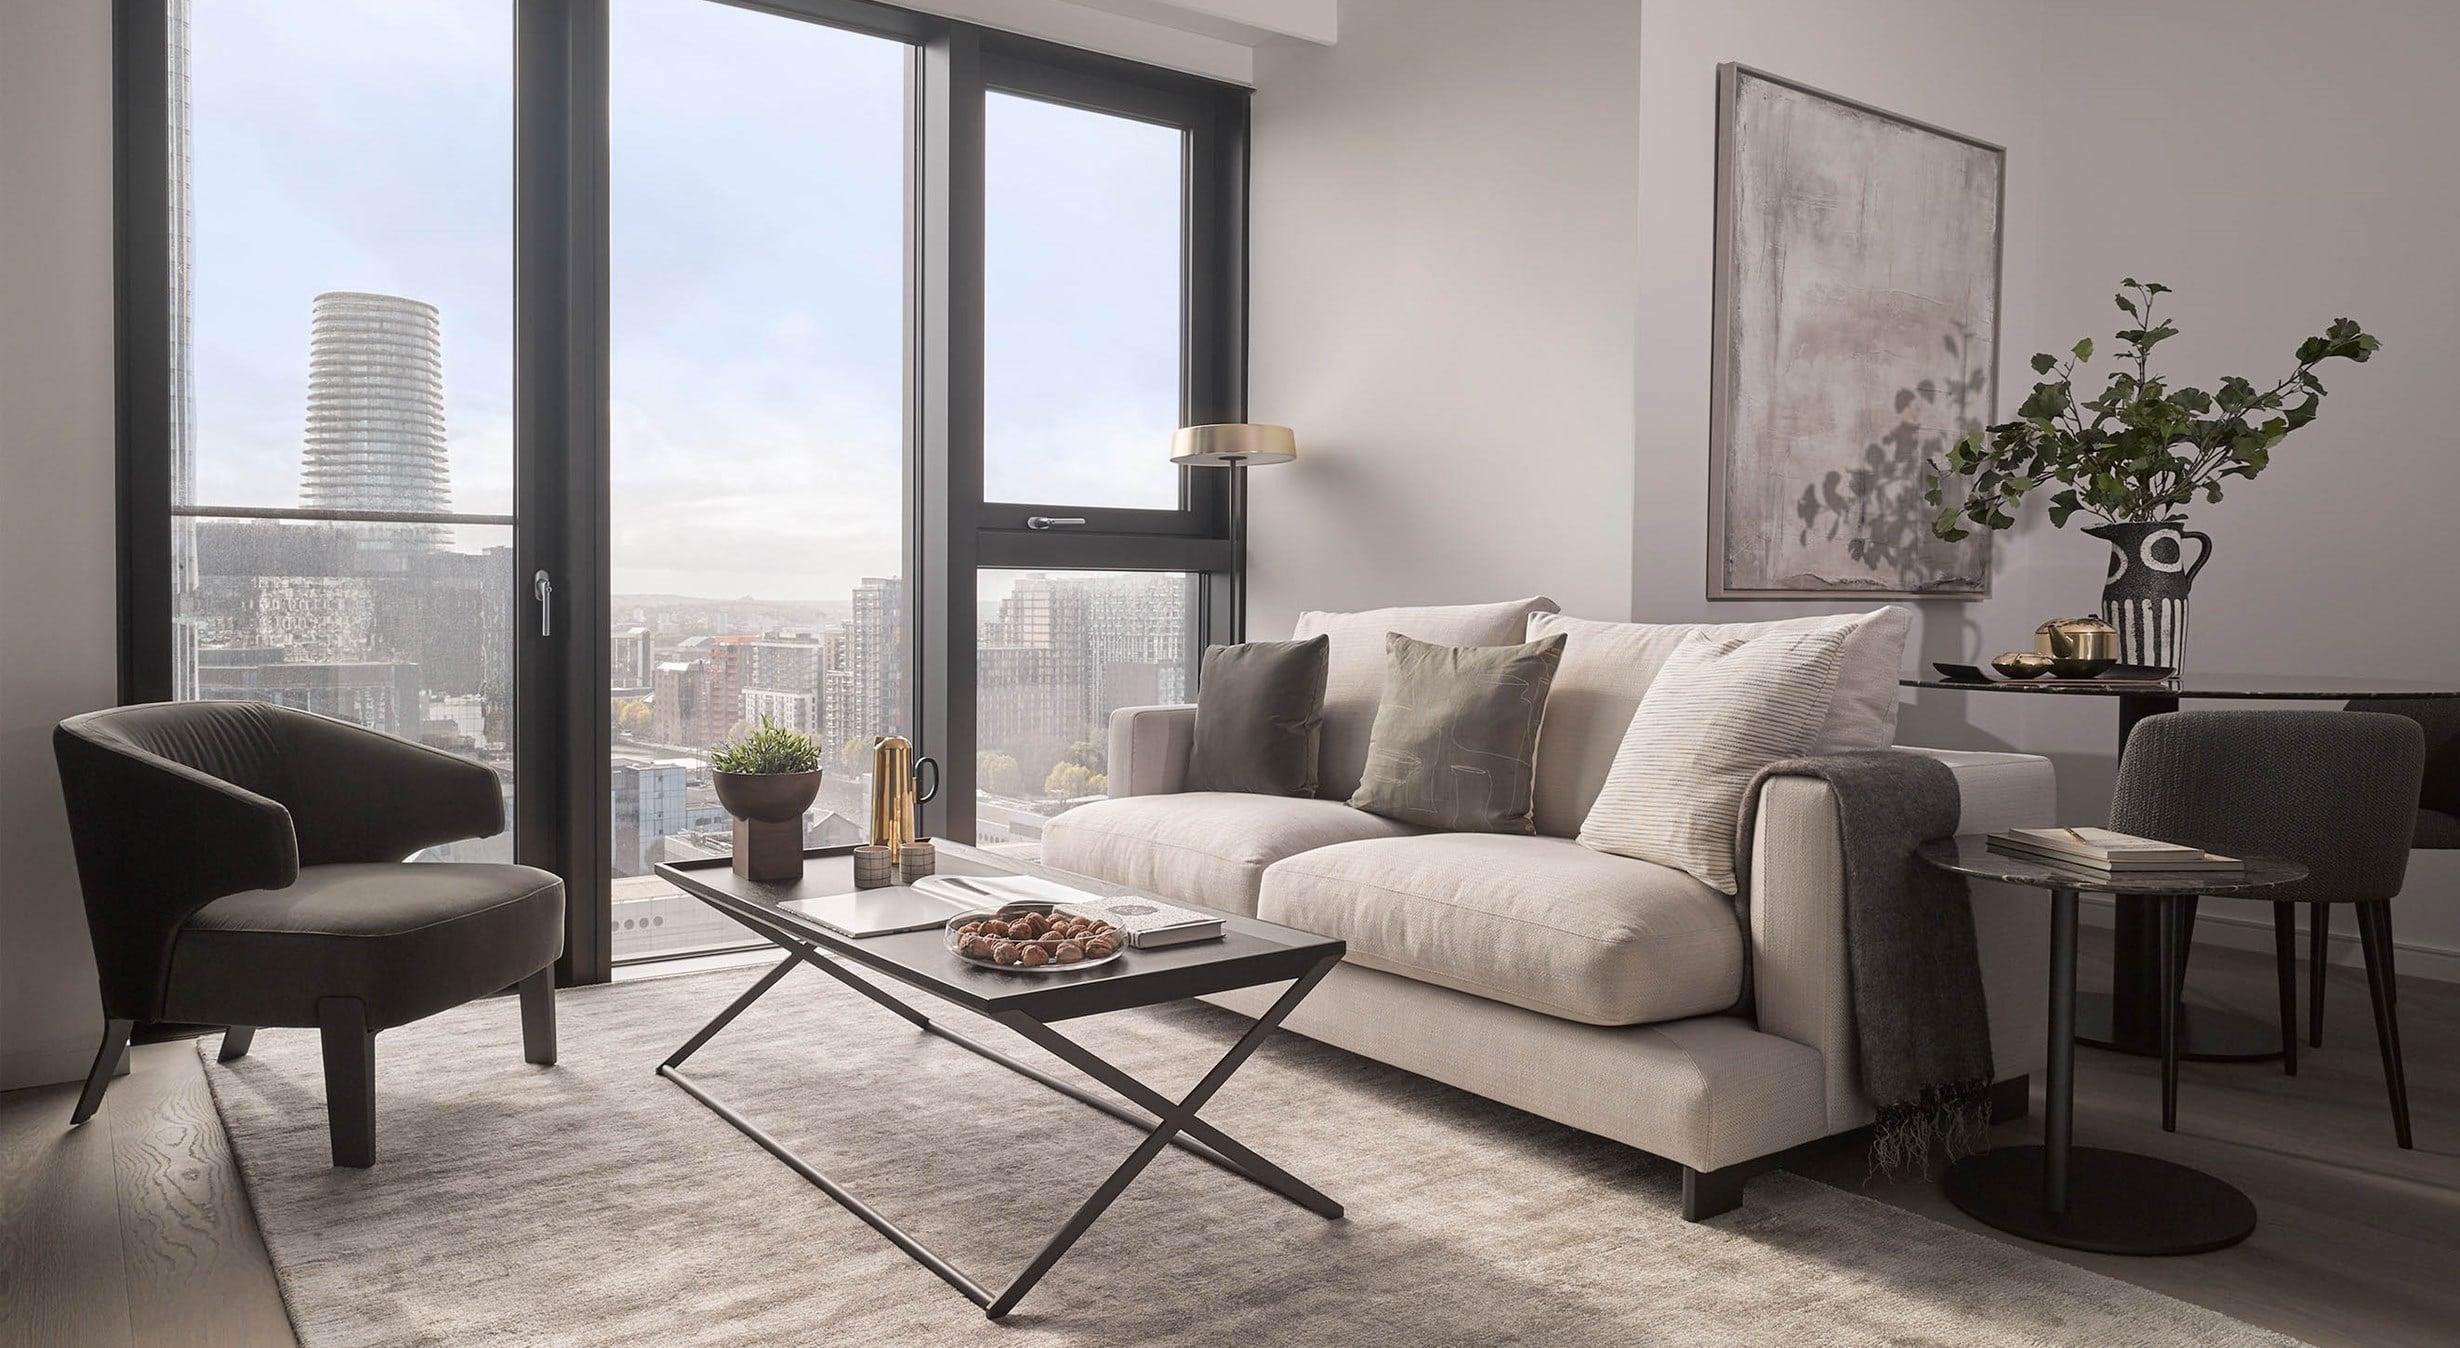 10 George Street Apartment Canary Wharf